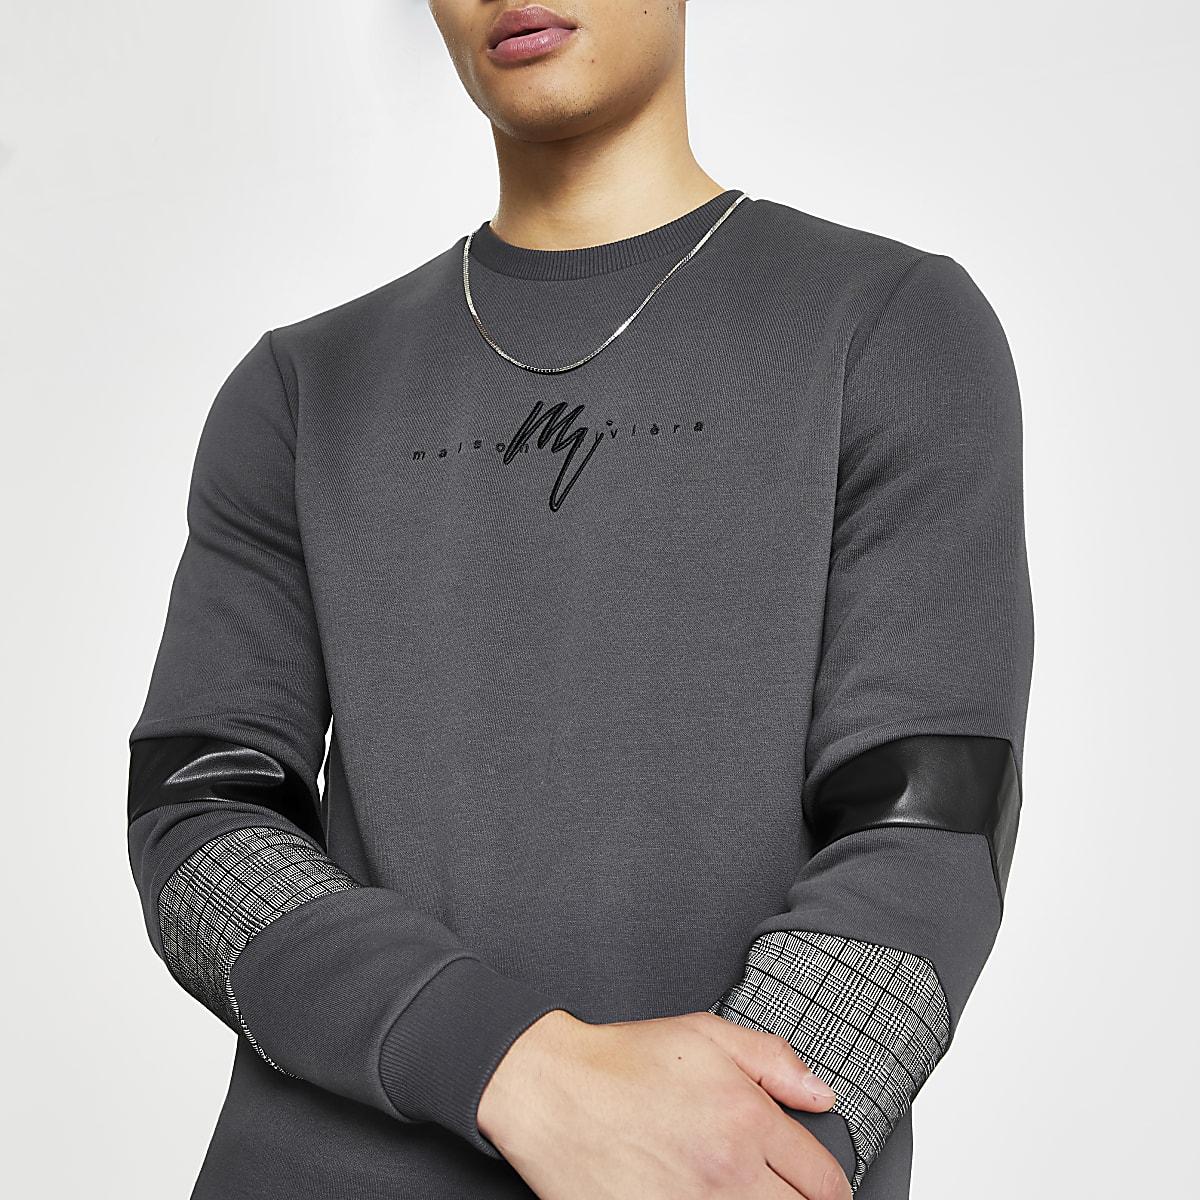 Grey Maison Riviera blocked sweatshirt